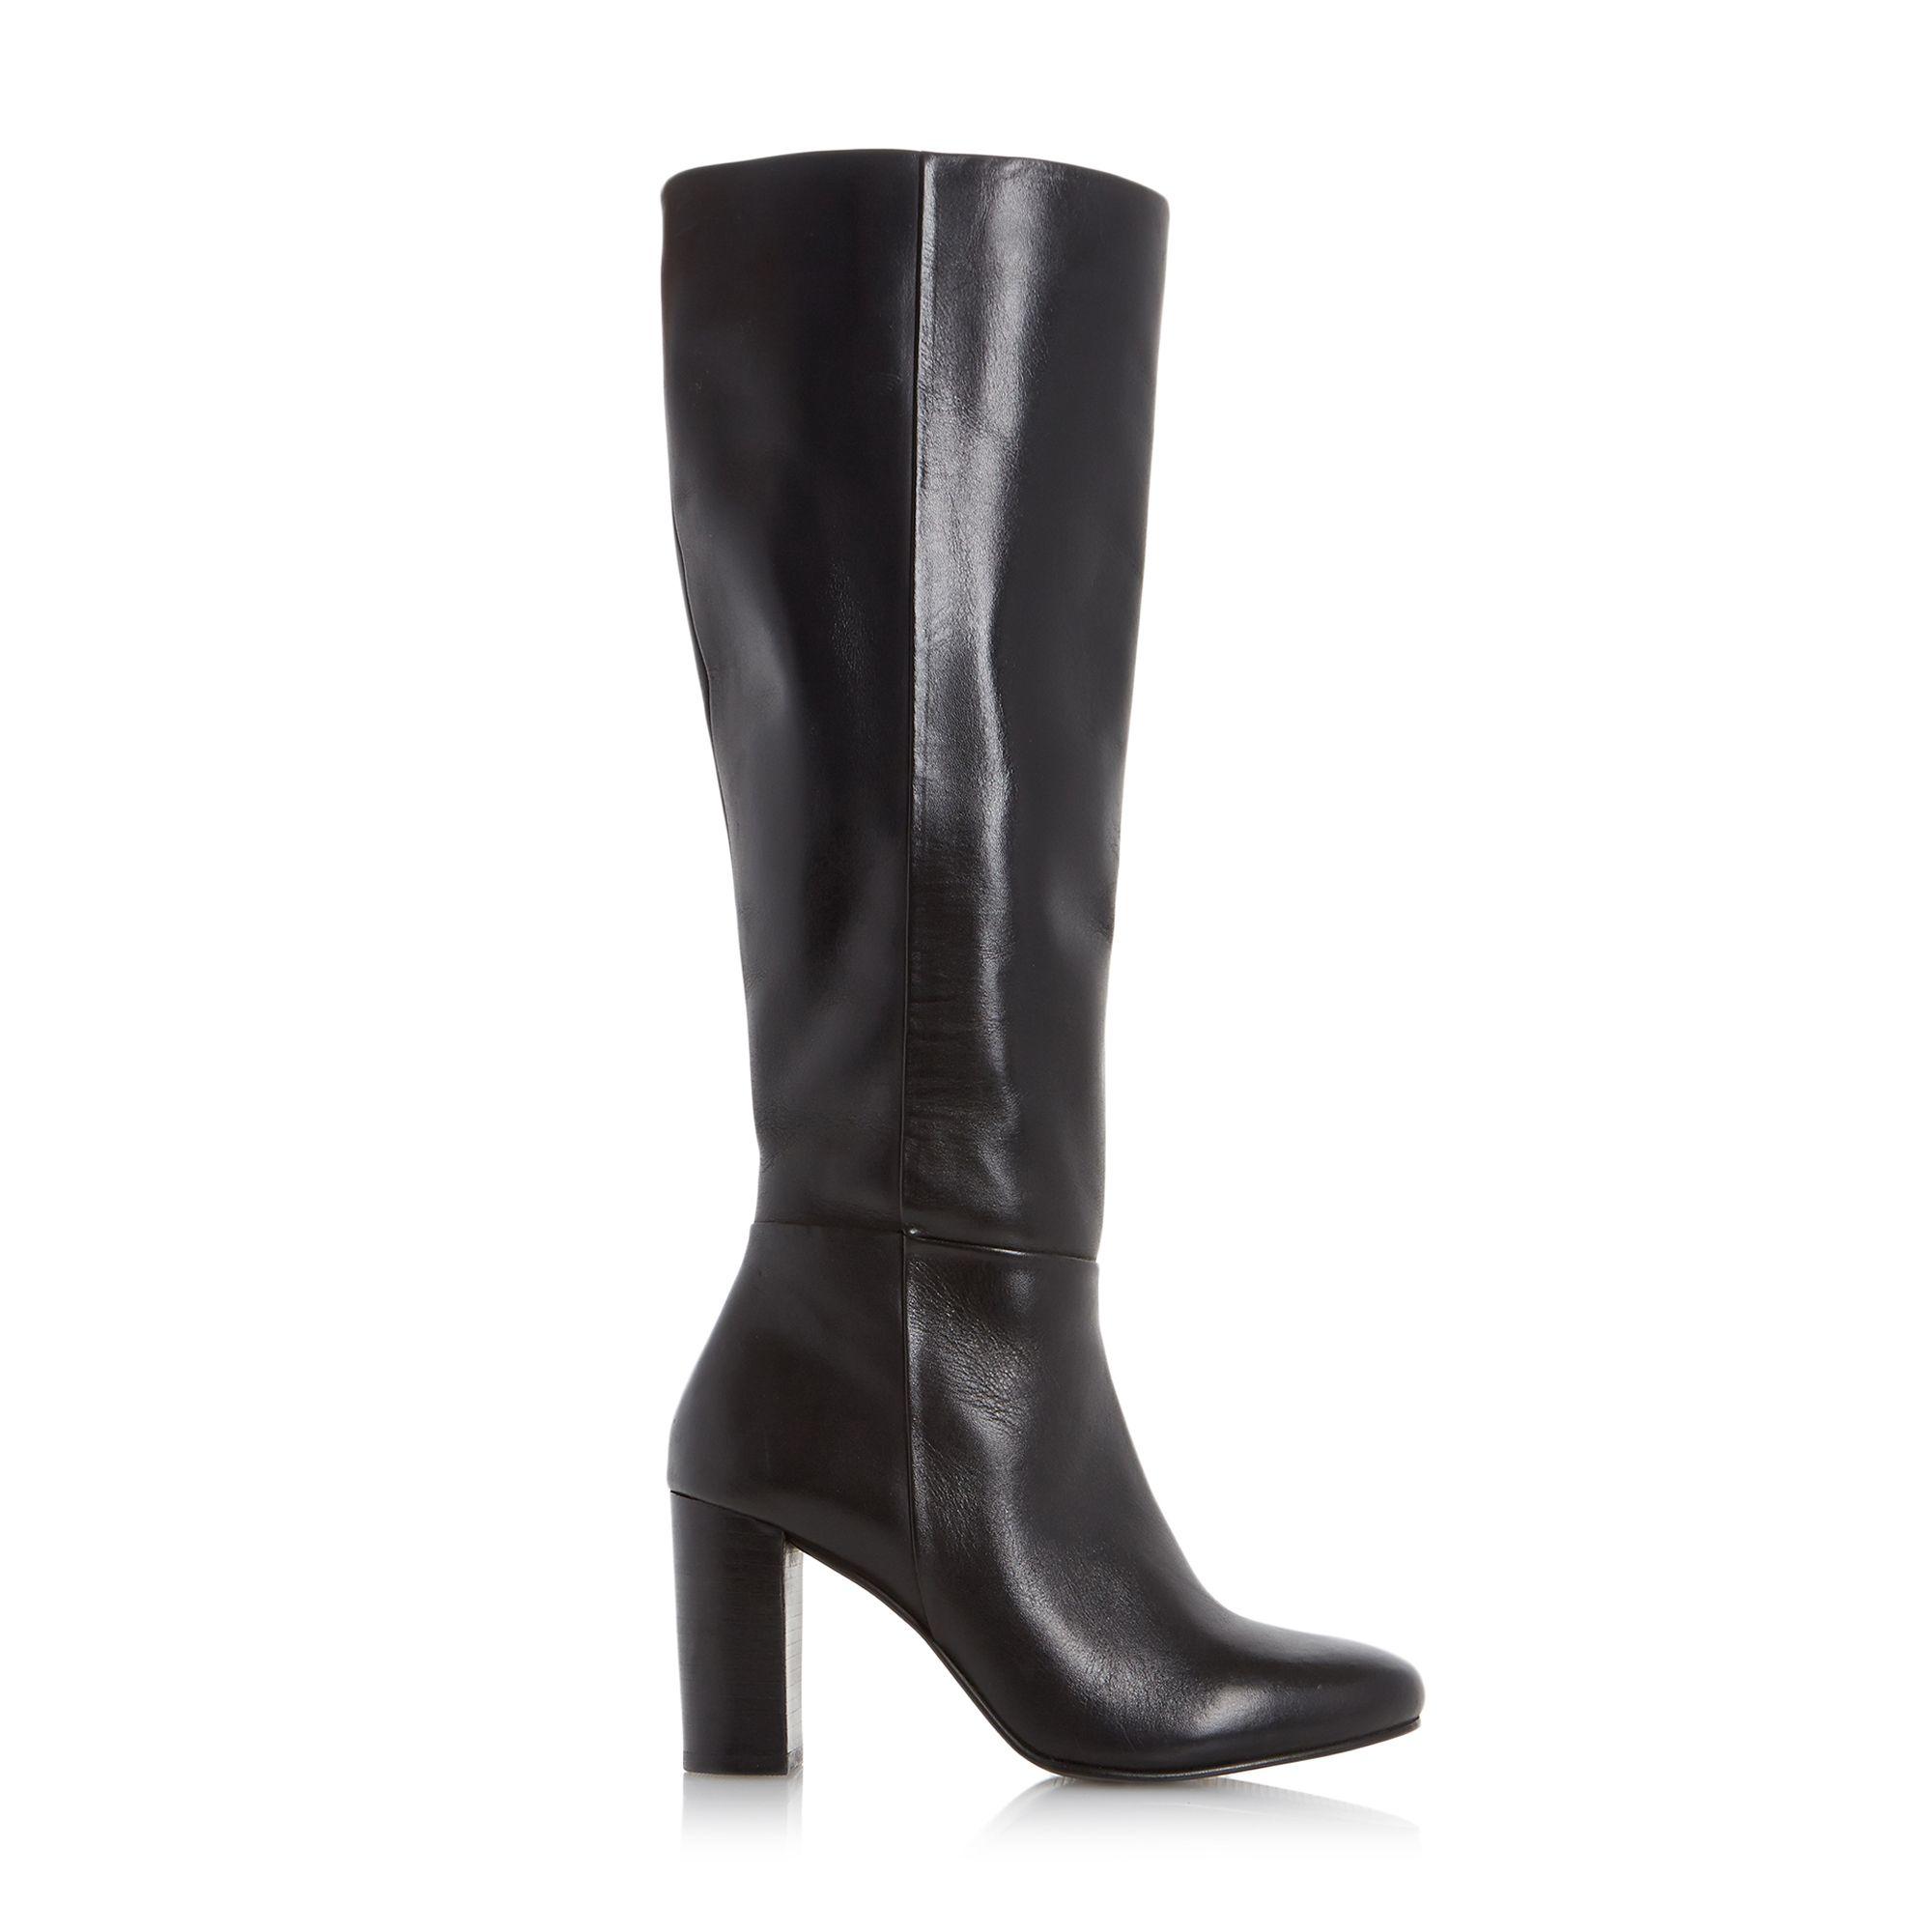 dune siena block heel leather knee high boots in black lyst